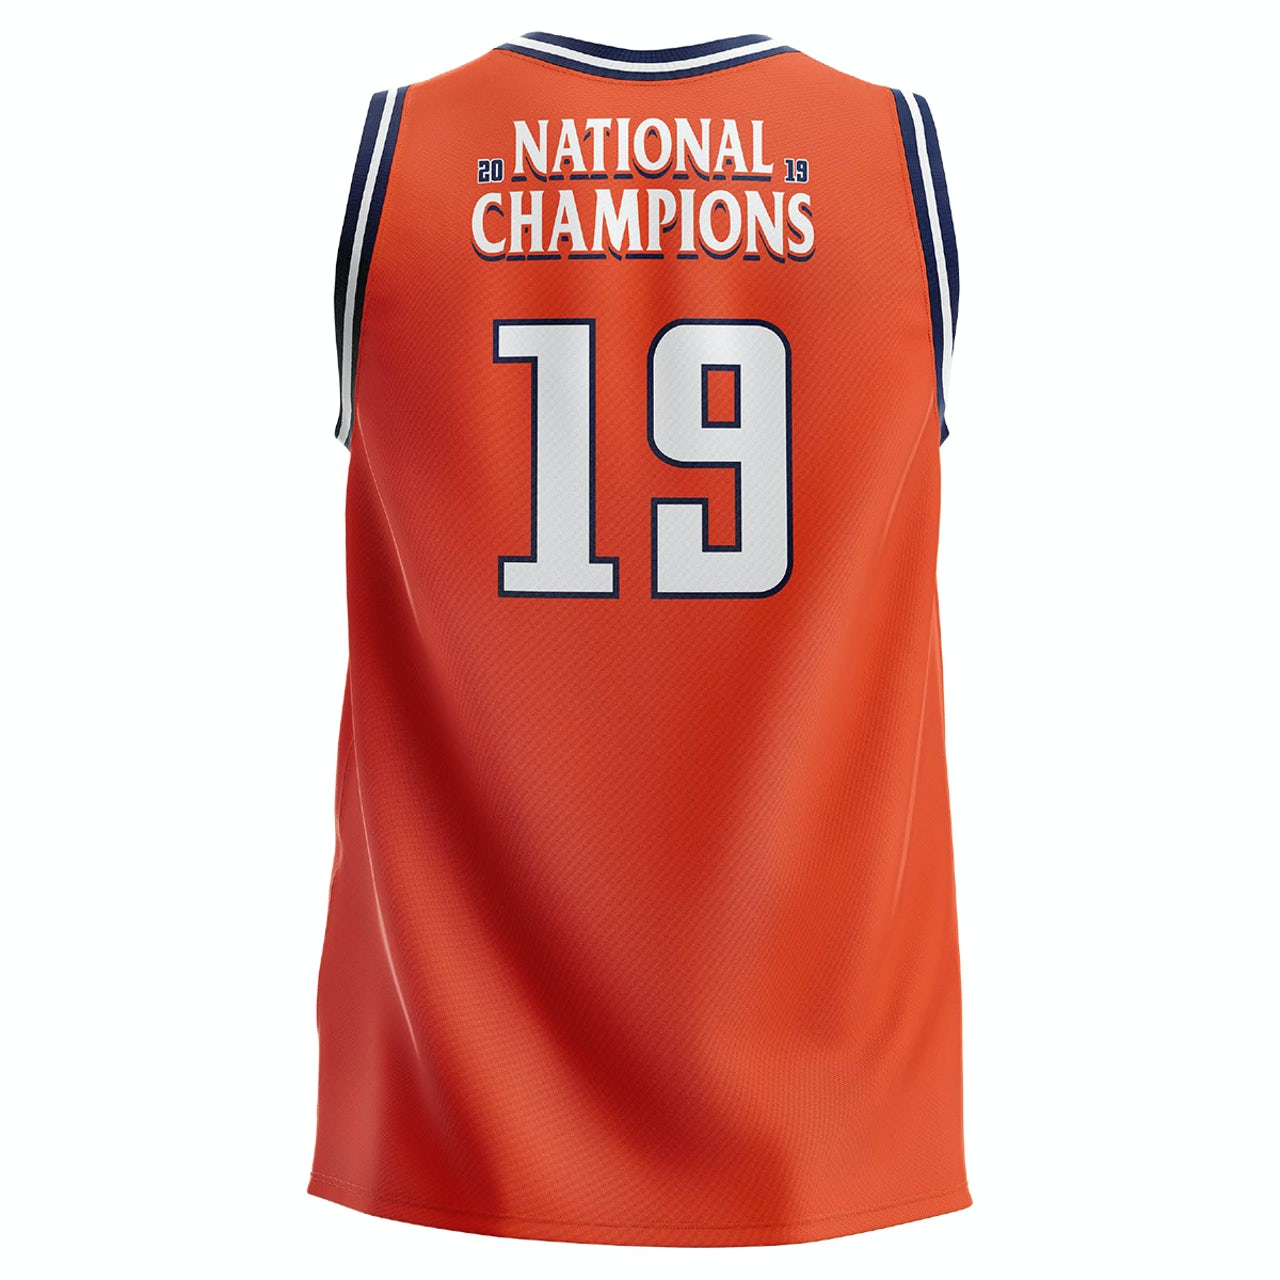 e14dbb426 UVA Athletics 2019 National Champions Youth Orange Jersey